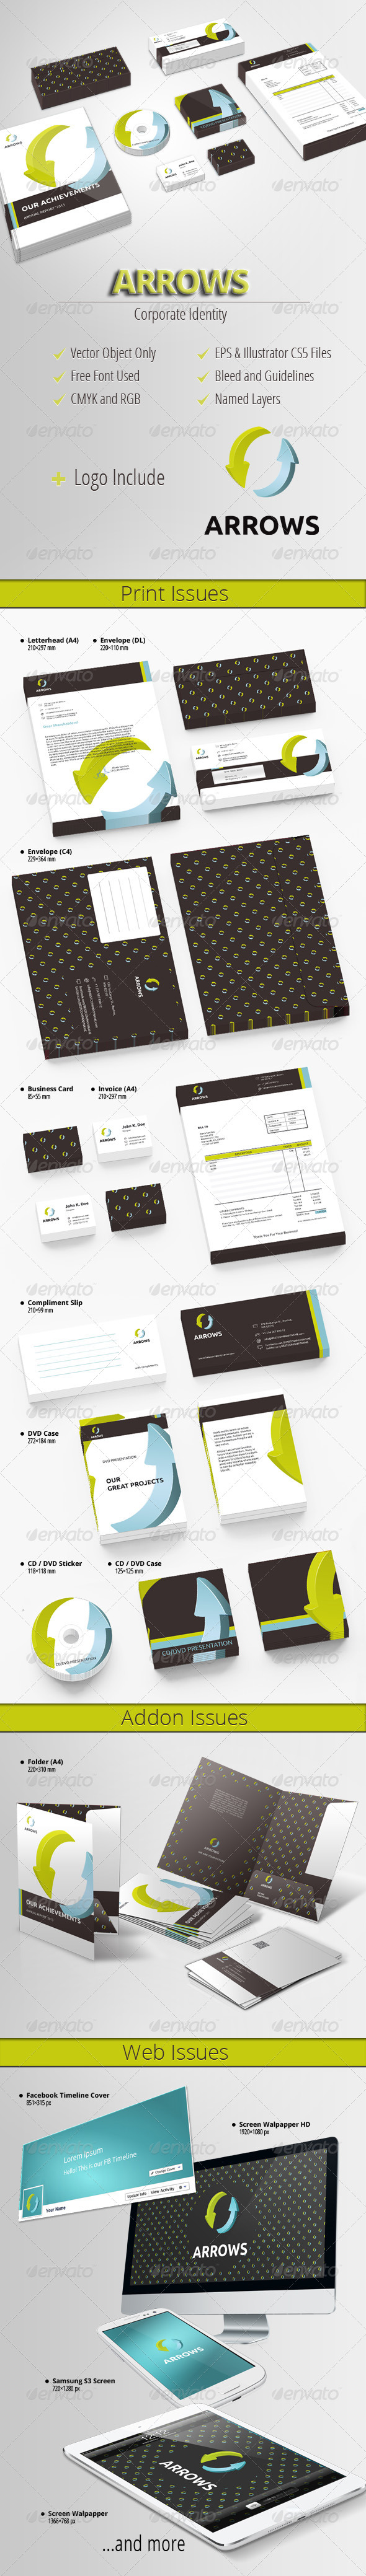 GraphicRiver Arrows Modern Corporate Identity 4573982